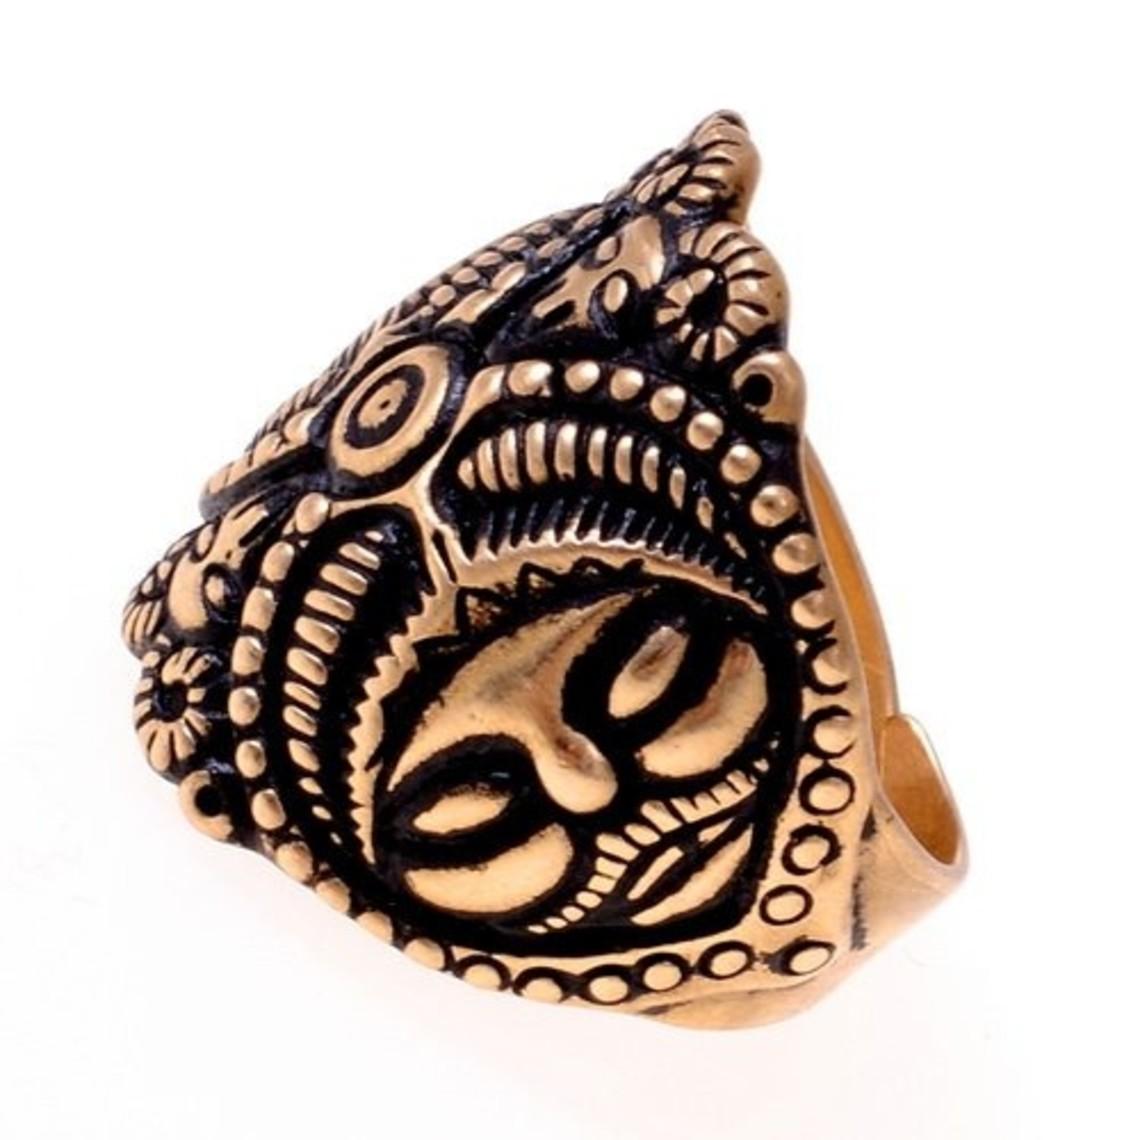 Anillo celto La Tène, bronce